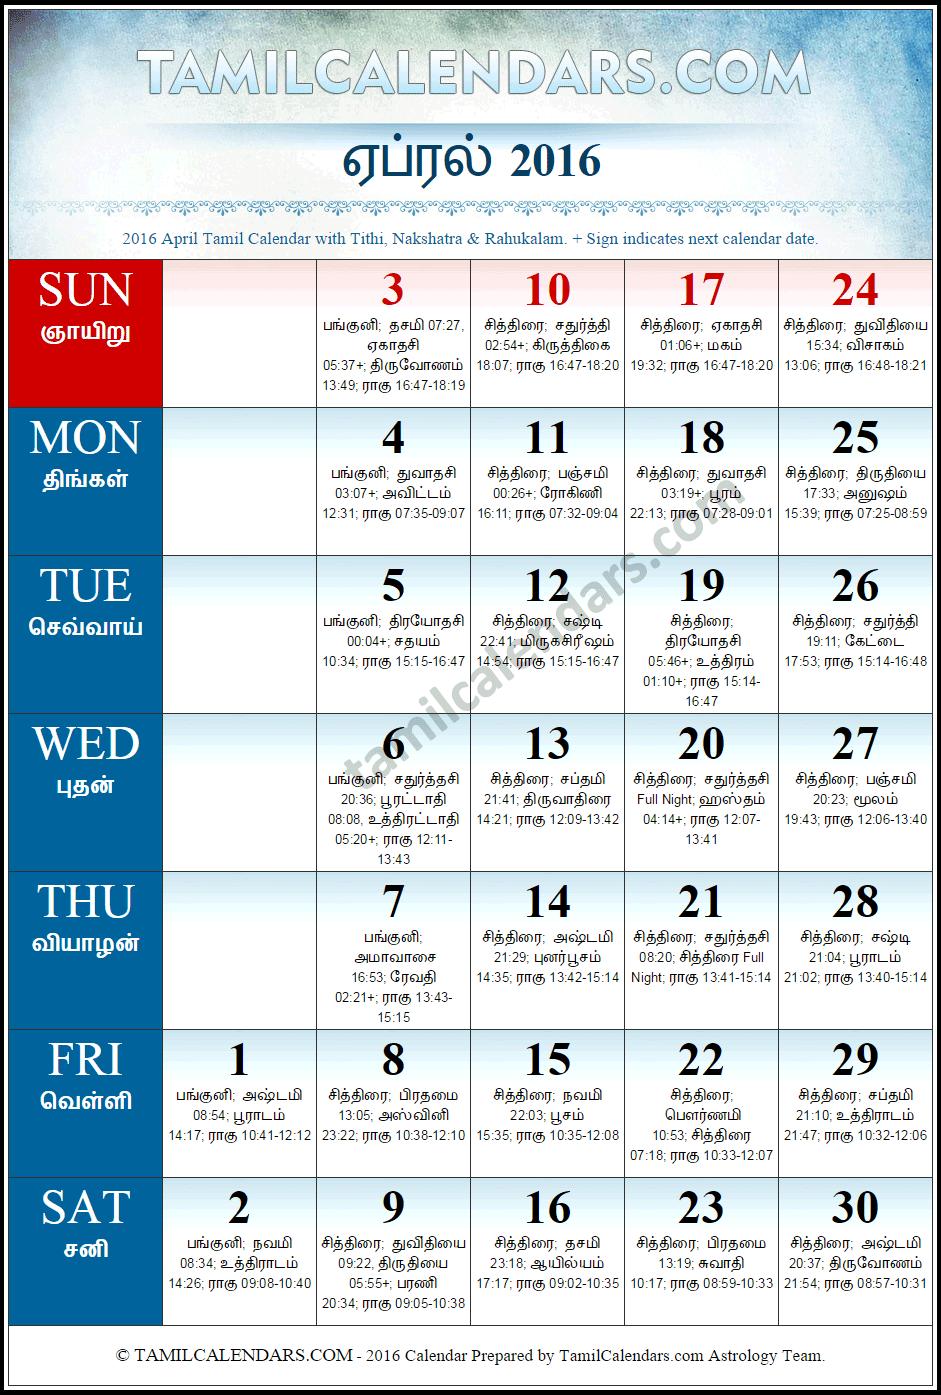 April Calendar London : Tamil calendar london newcalendar